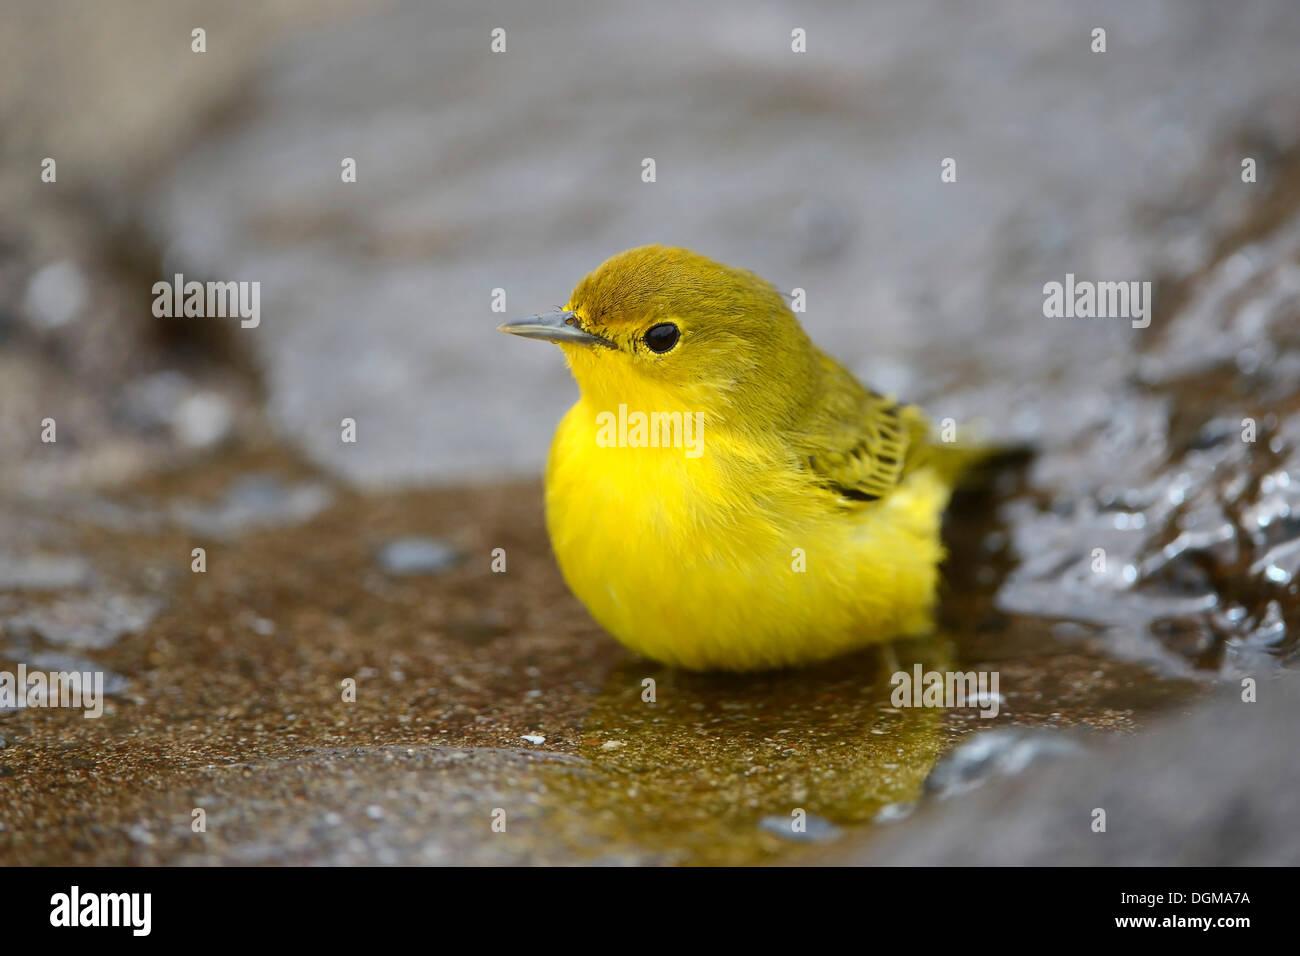 Schnäpperrohrsänger (Dendroica Petechia Aureola), Altvogel, Männlich, Punta Cormoran, Floreana Insel, Galapagos, Ecuador Stockbild